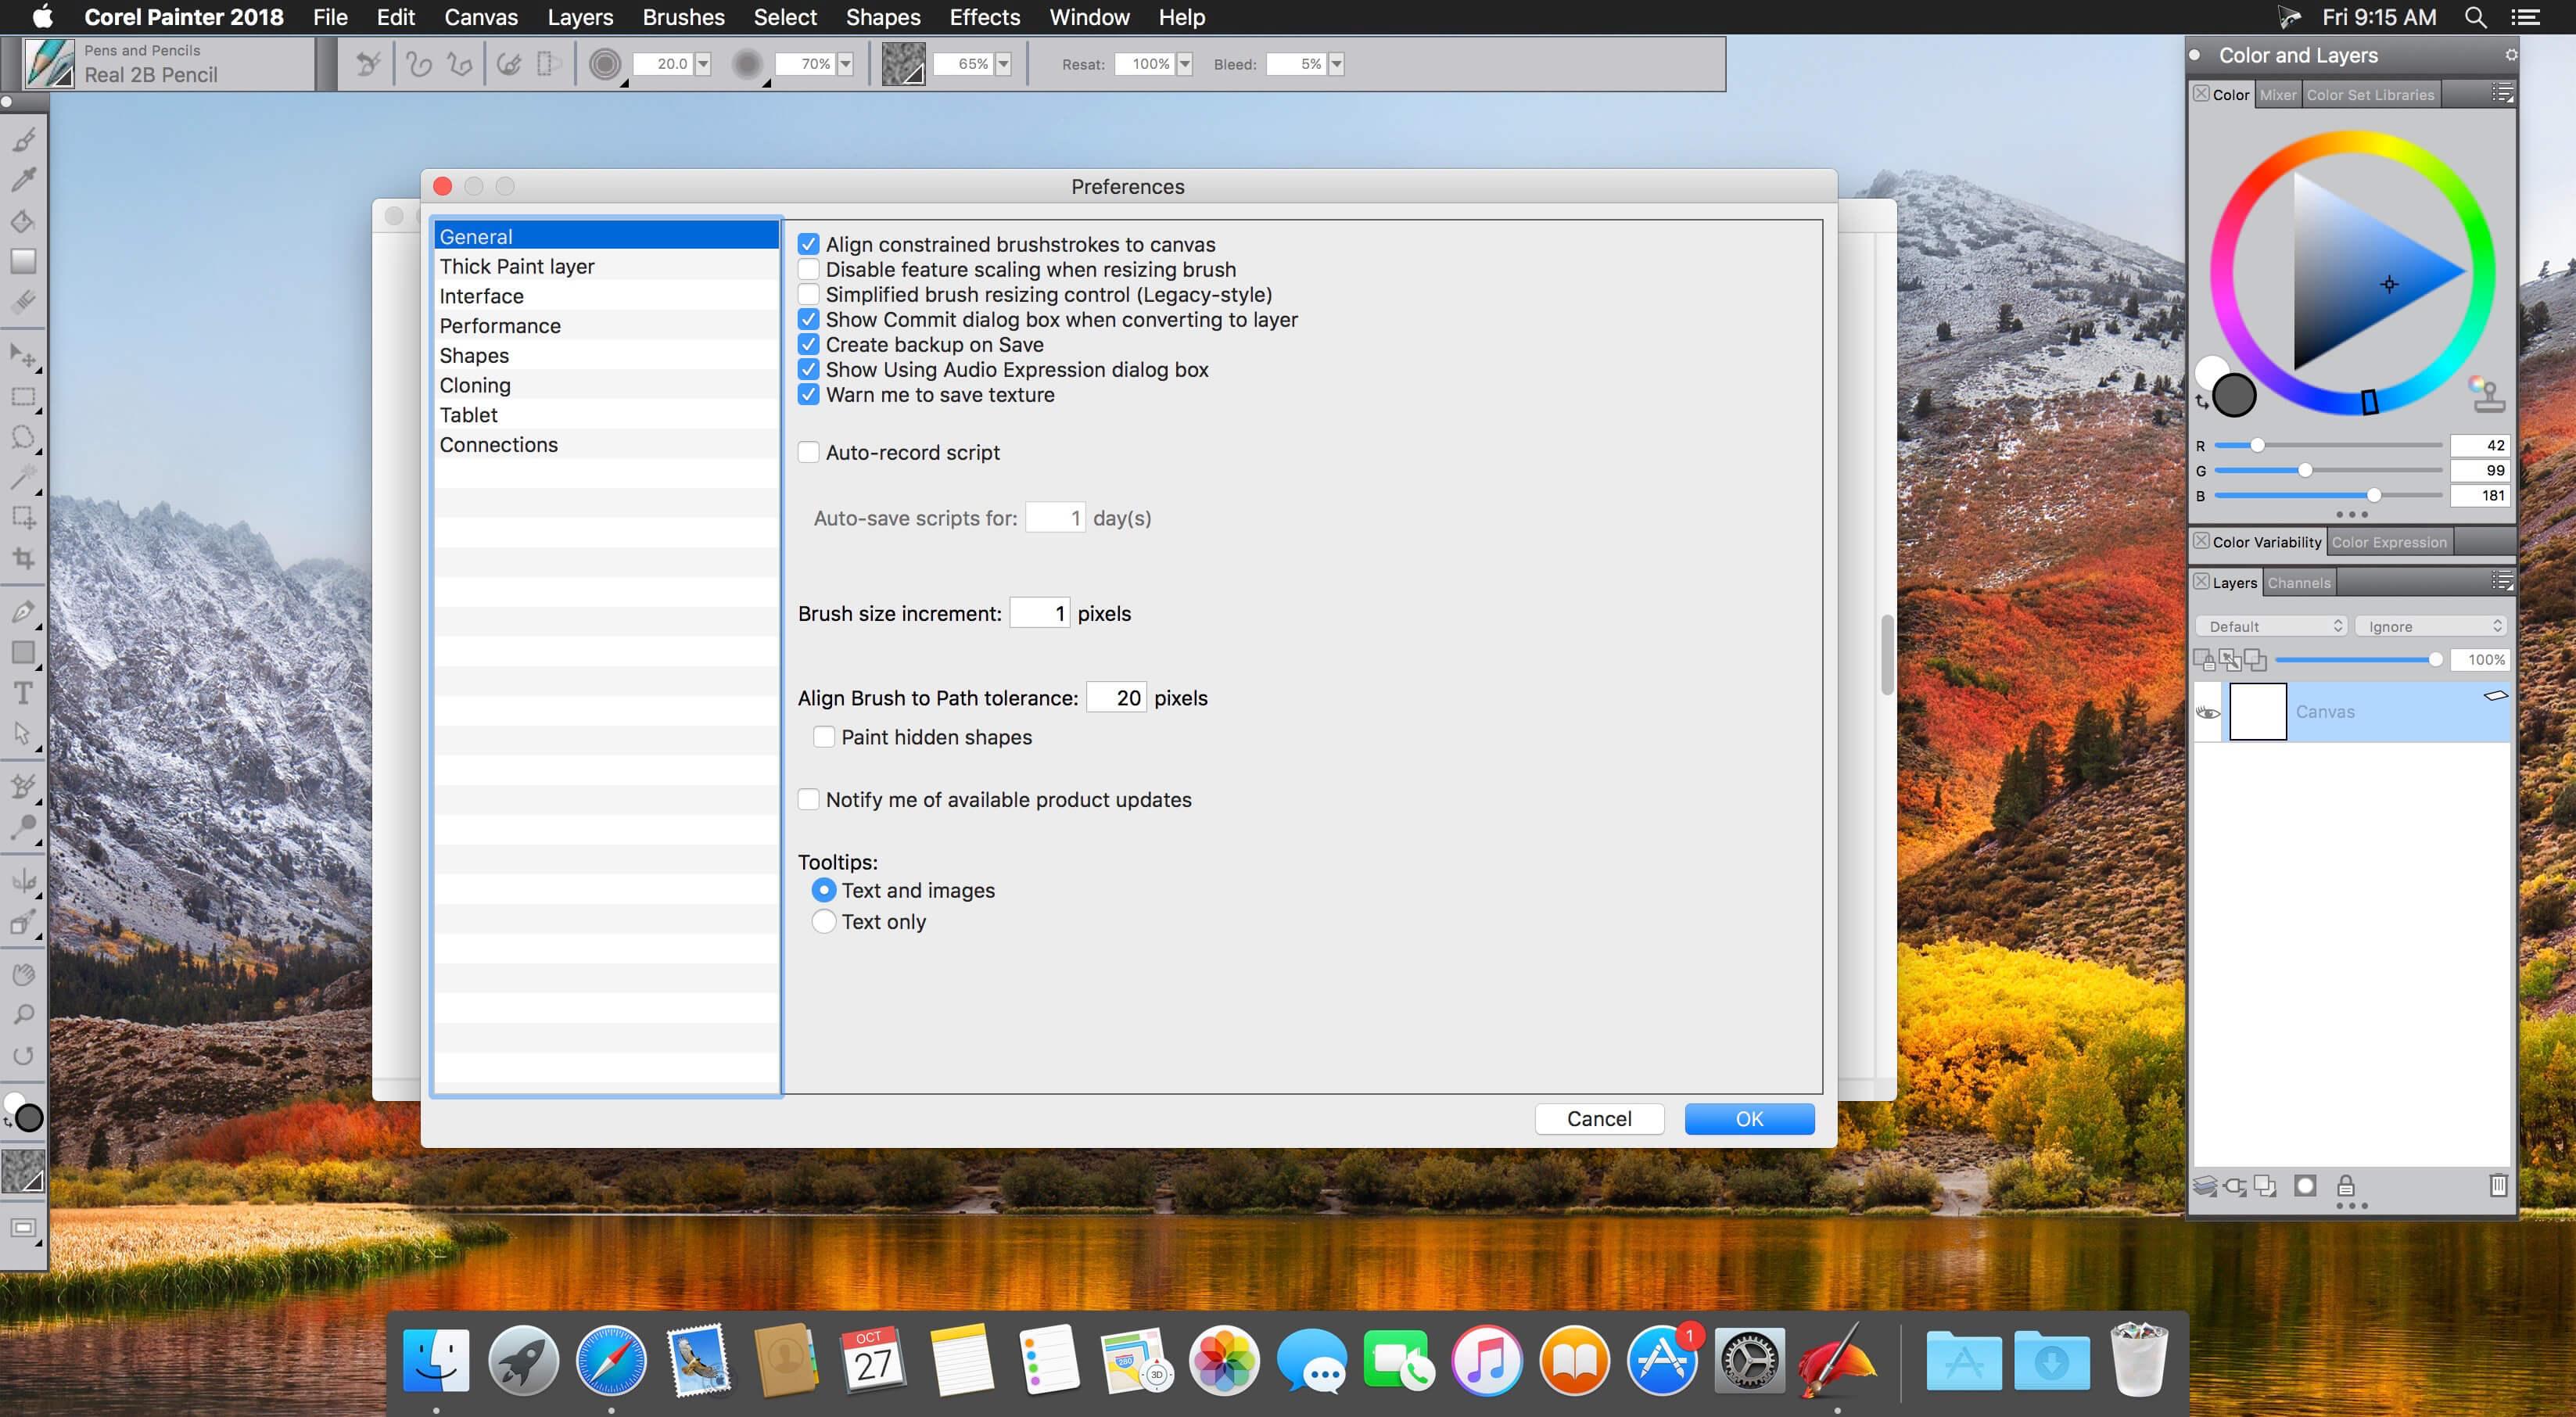 Corel Painter 2019 v19 1 0 487 download | macOS